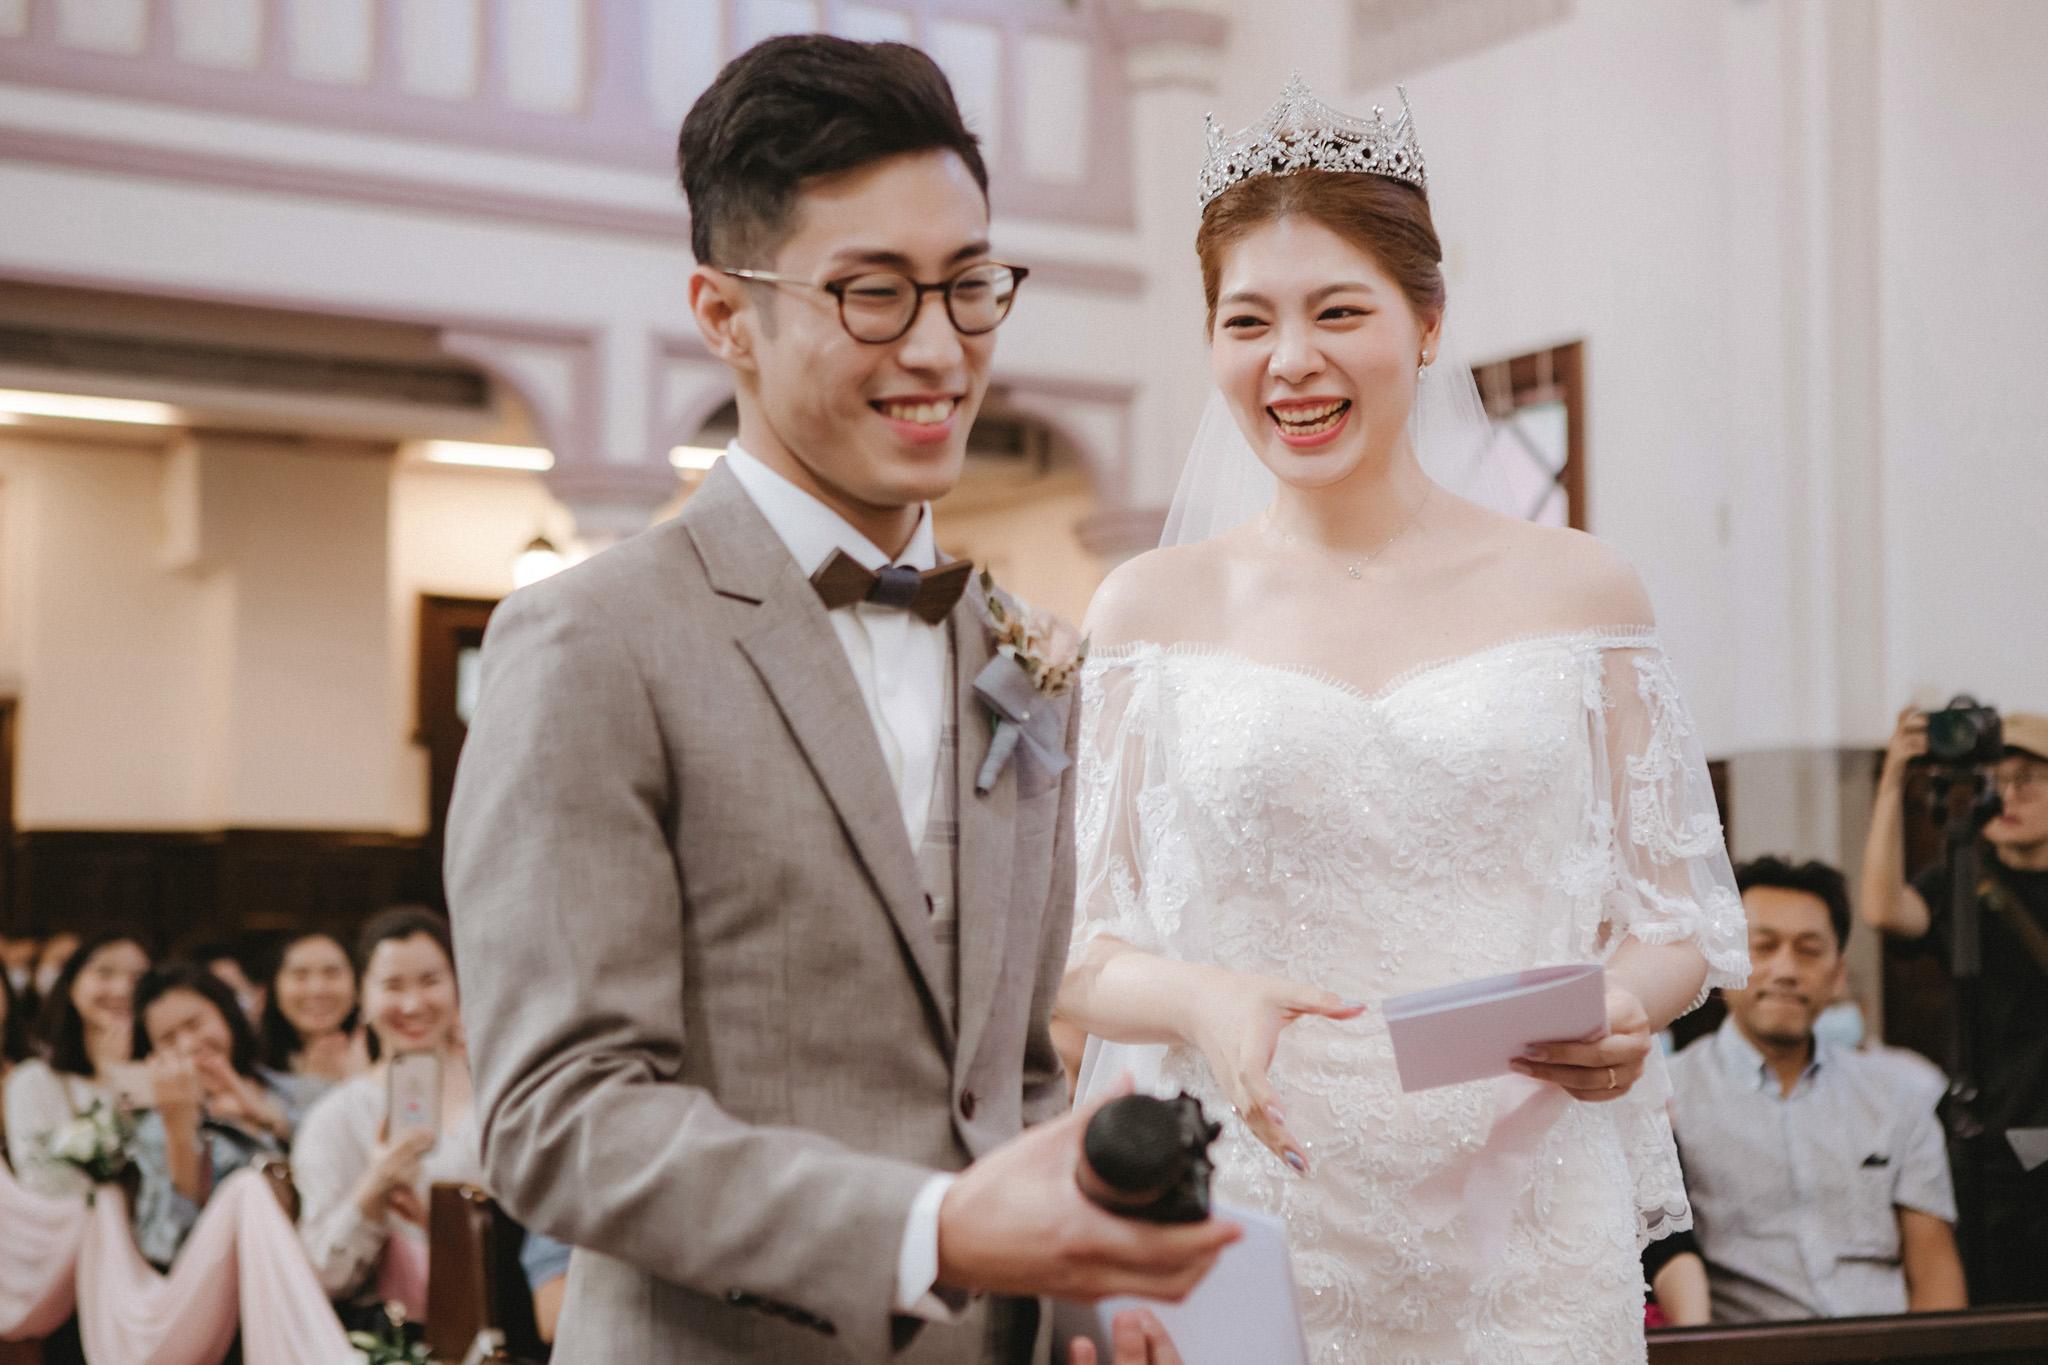 EW 台北婚攝 居米 濟南教會 Brick Yard 33 美軍俱樂部 婚禮 婚宴-39